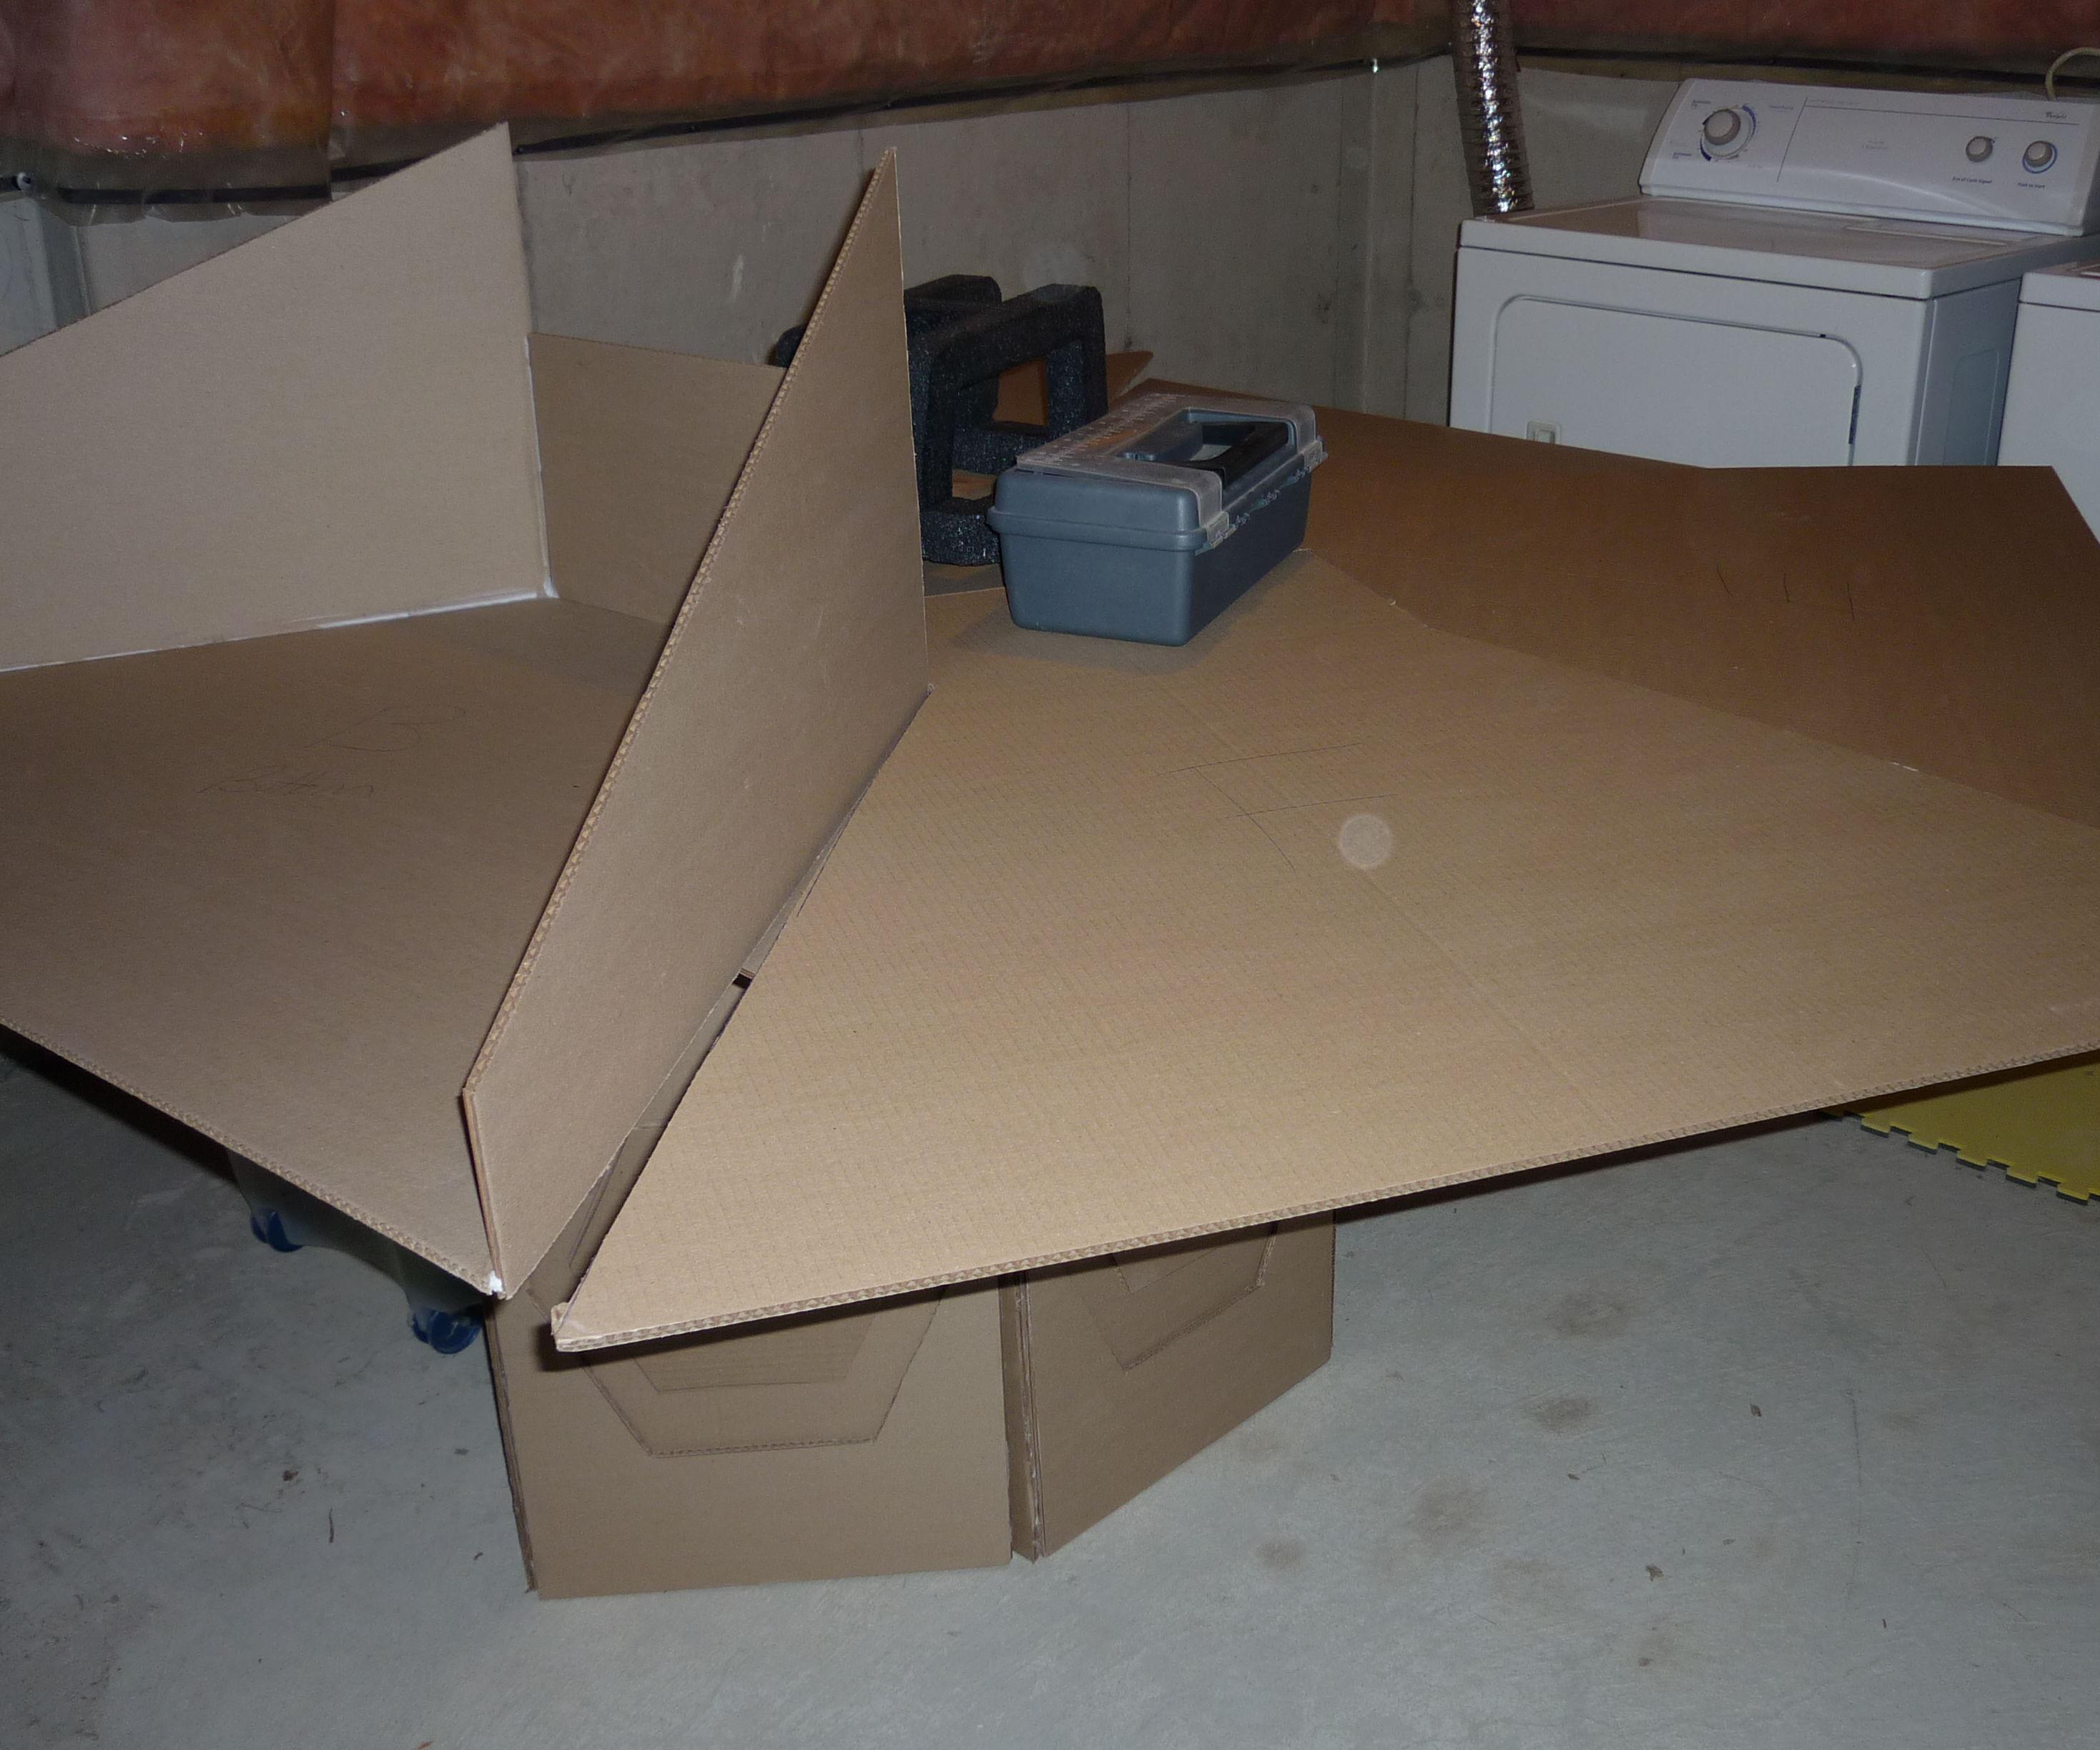 Doctor Who Tardis Cardboard Console